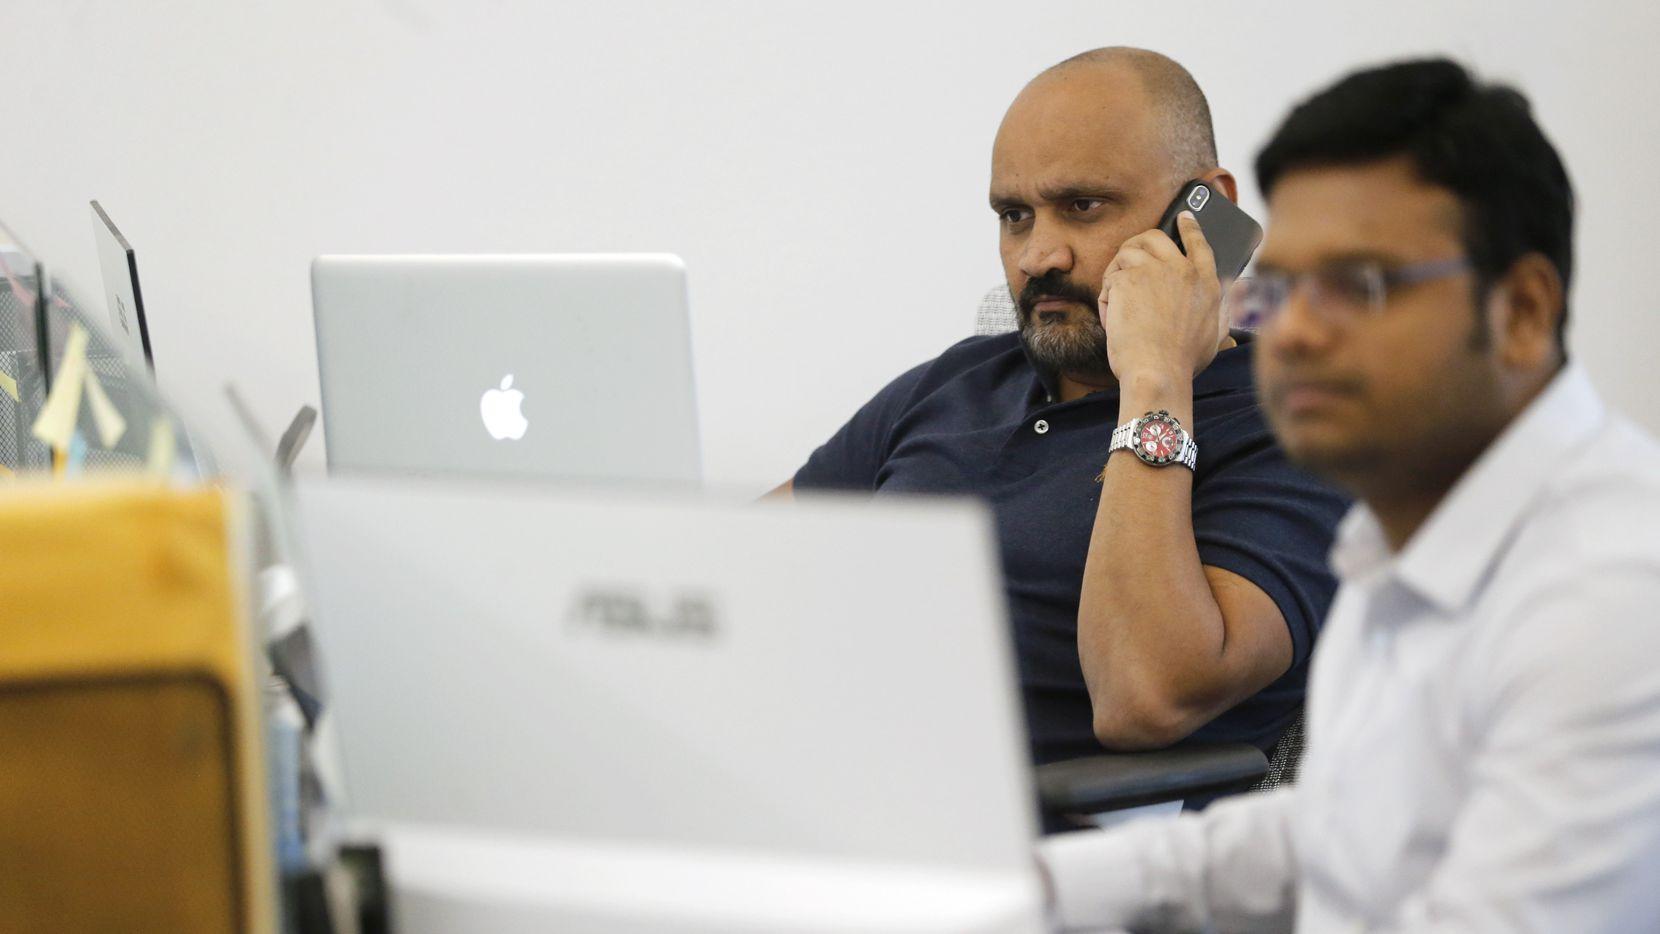 Nash Singi (left) worked from his desk next to Vikram Vunduru (right) at Qentelli in September.